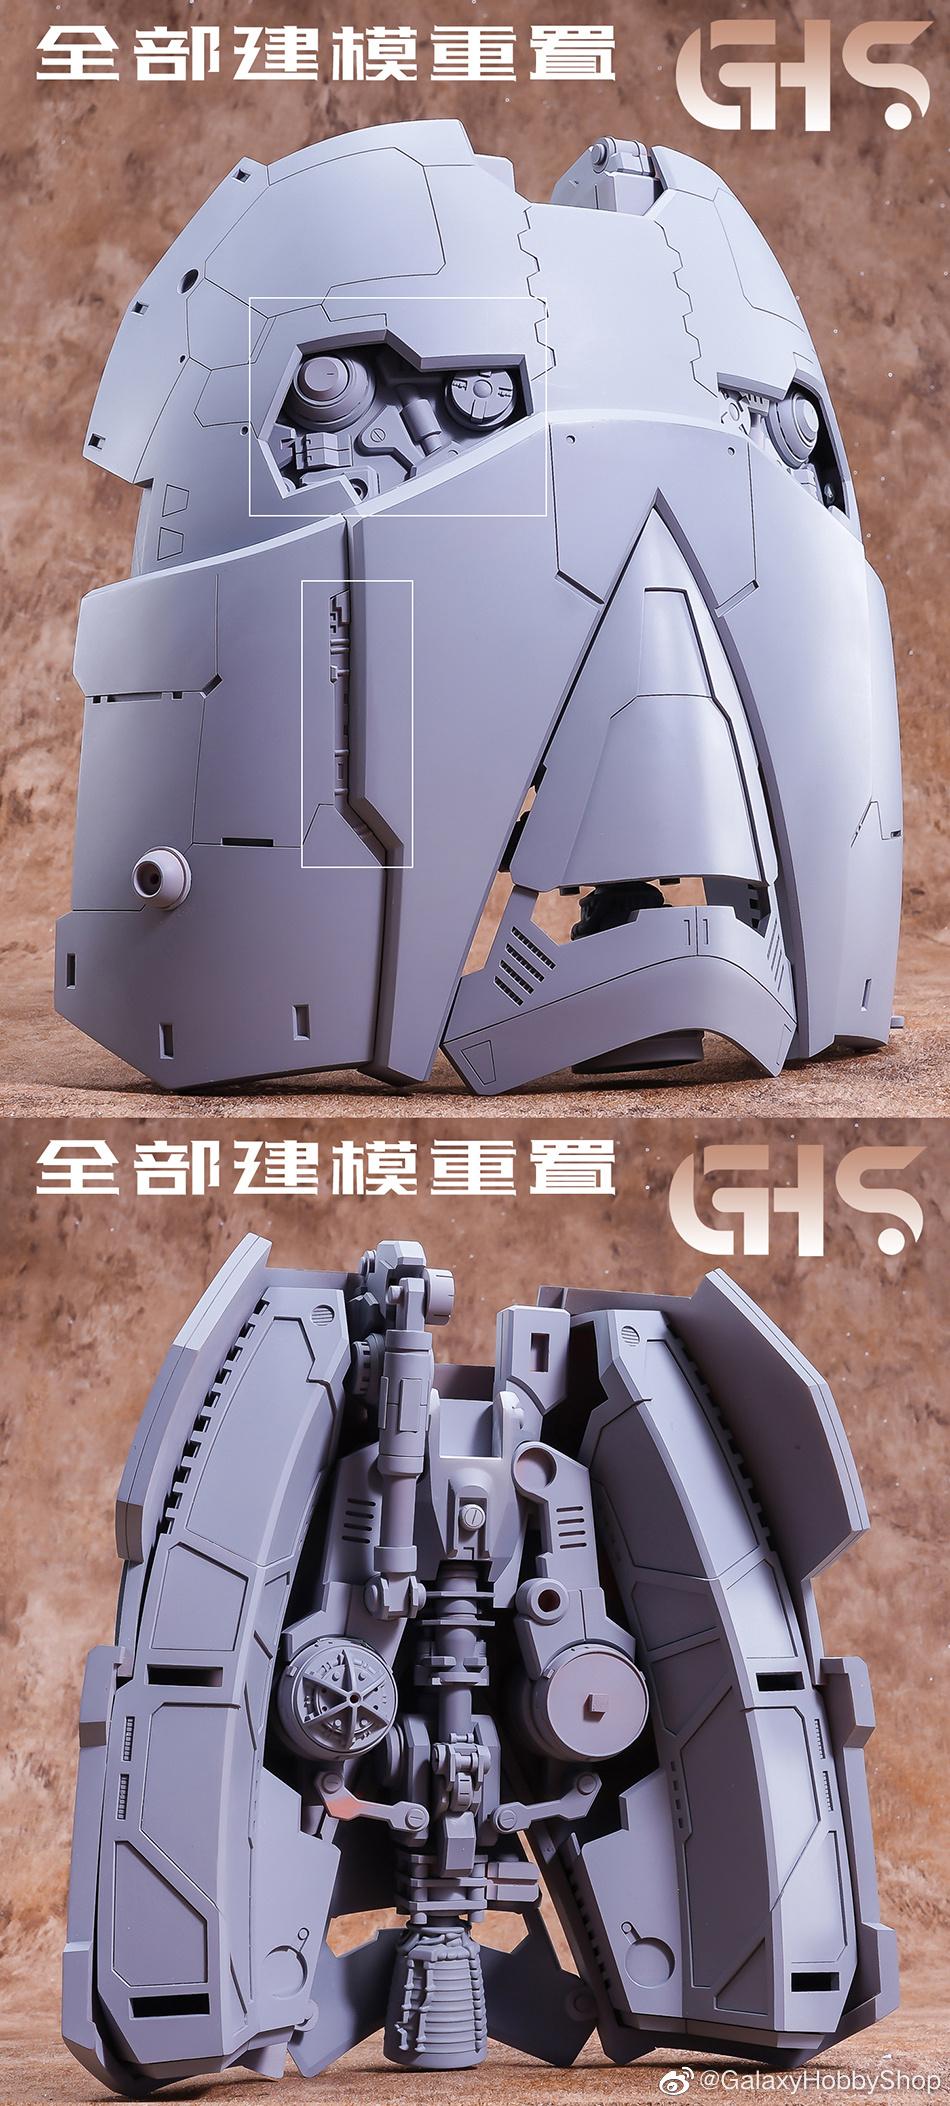 G871_GS_GSH_the_o_GK_008.jpg